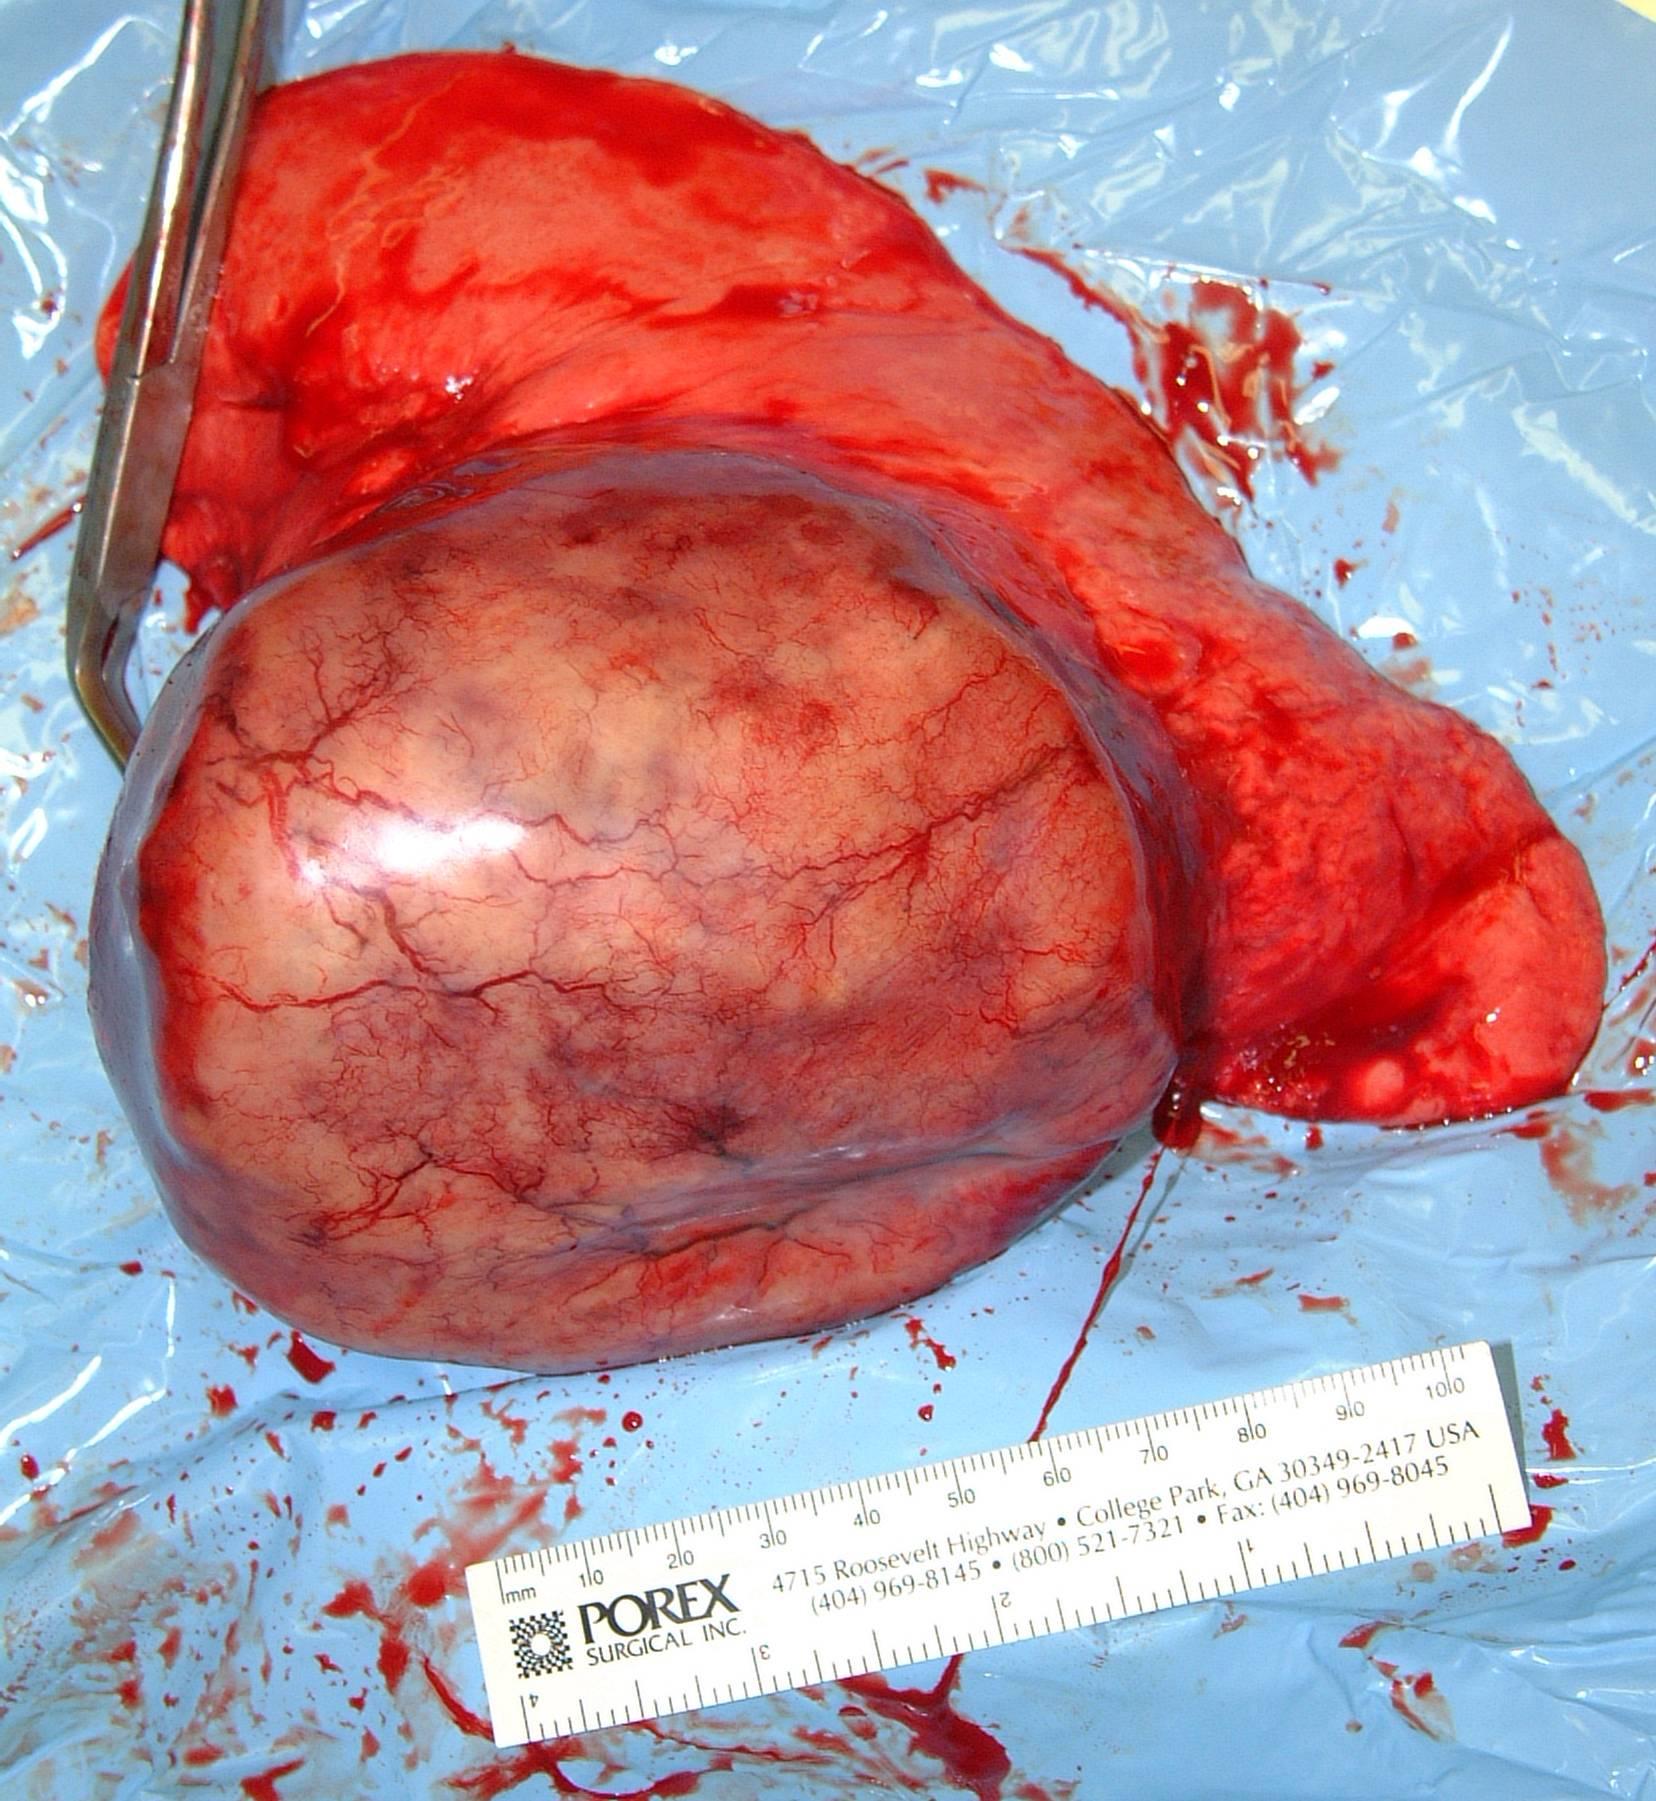 Primary Lung Carcinoma - Dog